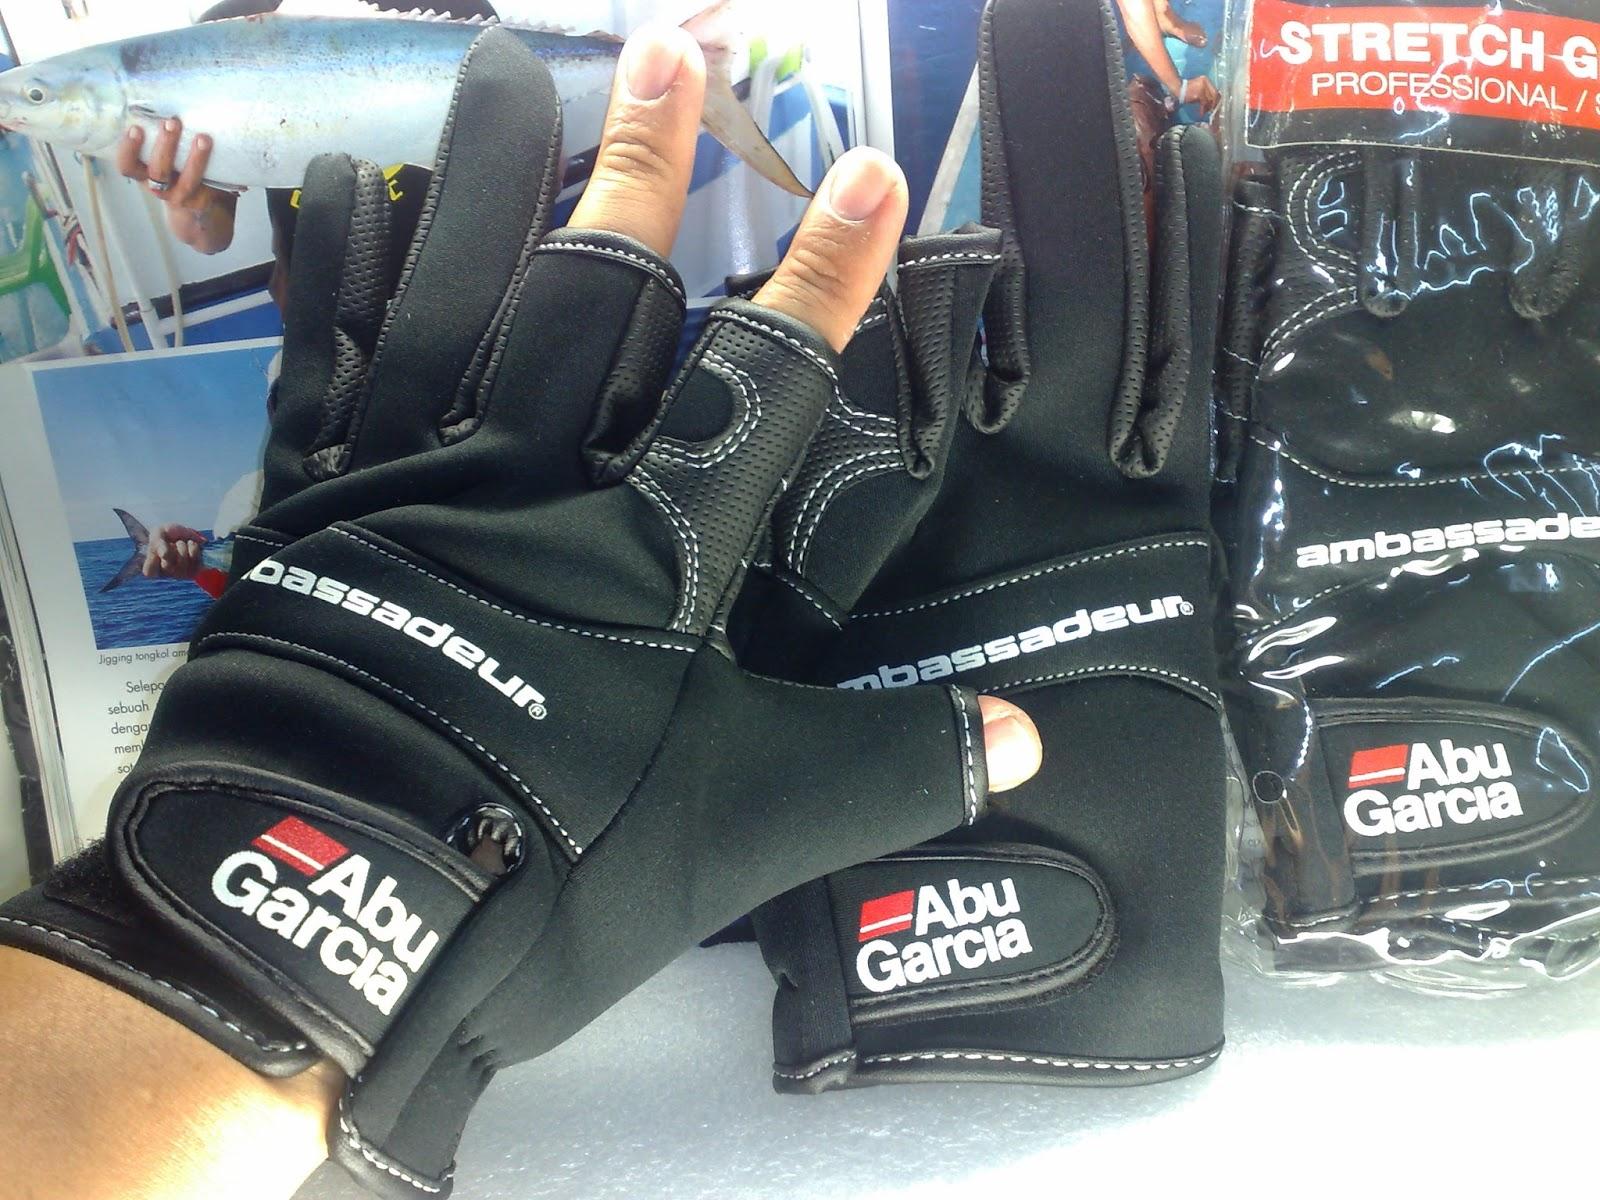 Abu gloves